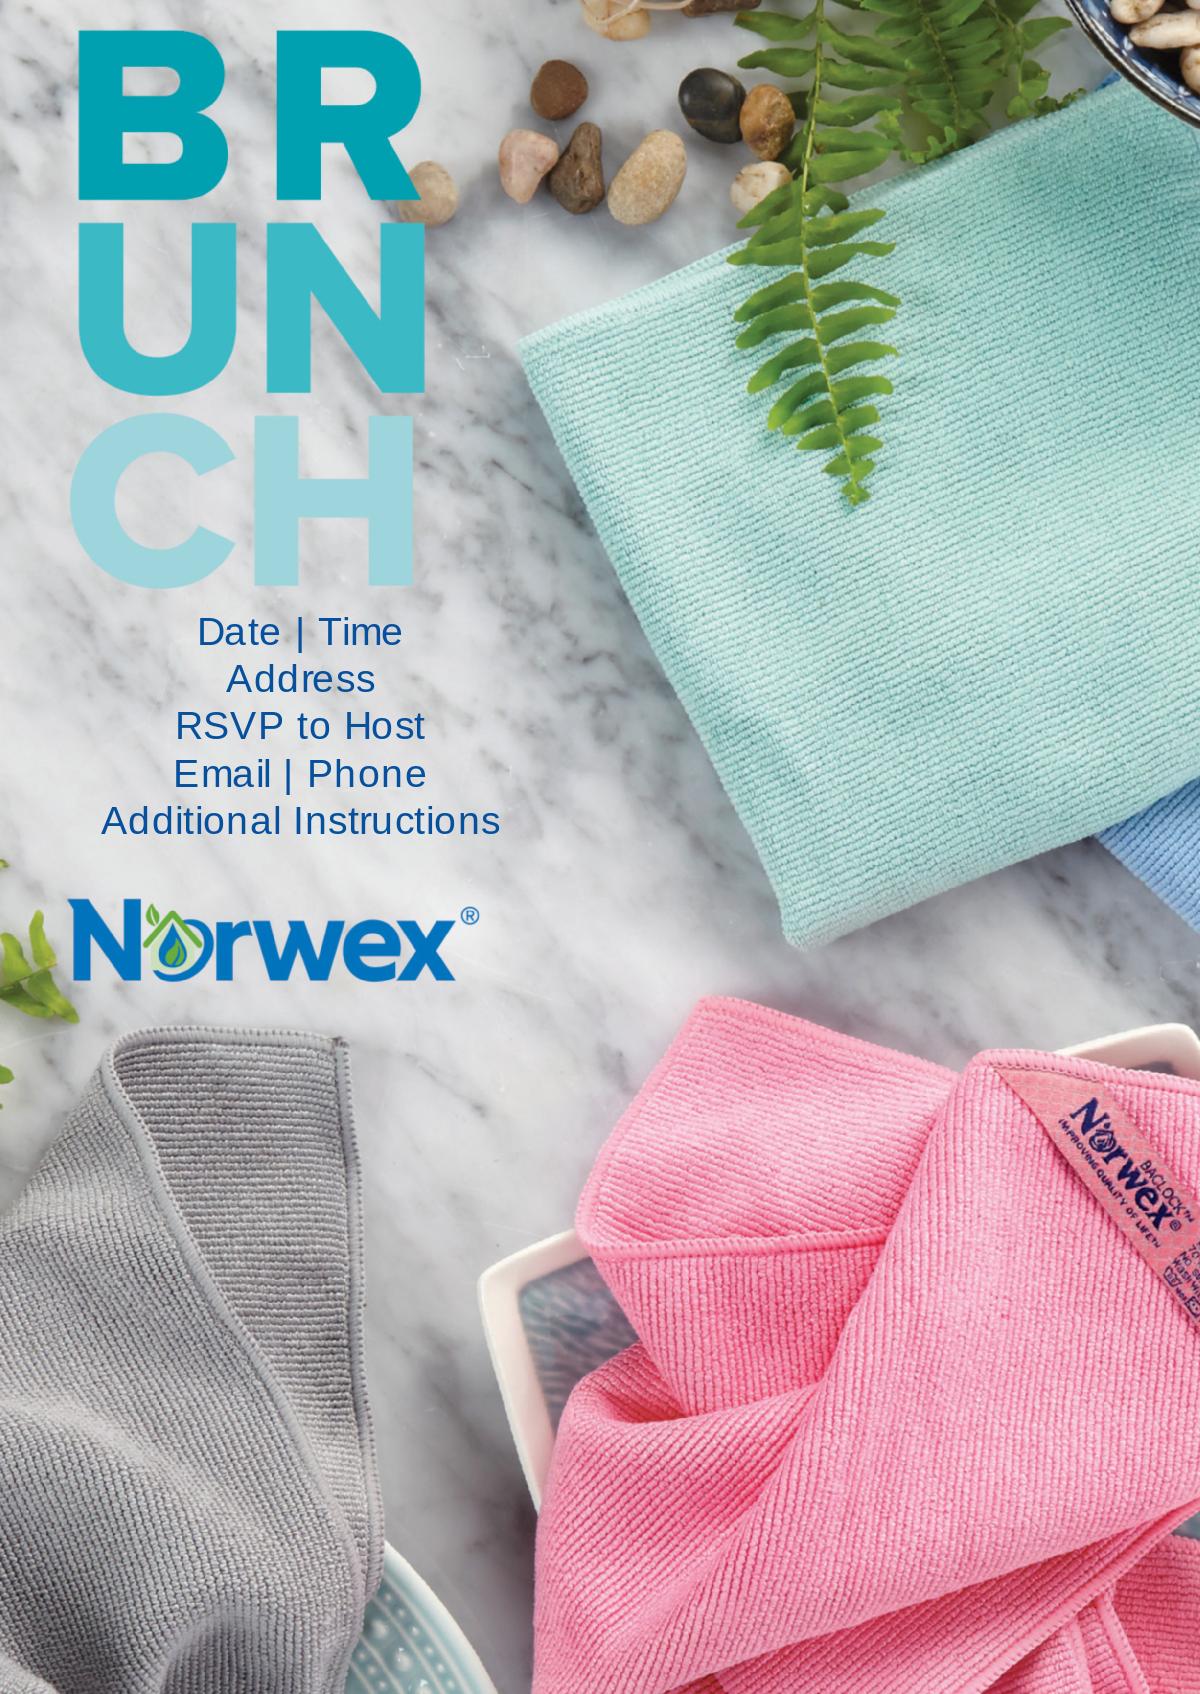 Norwex | Brunch Invite 2017 | Cards